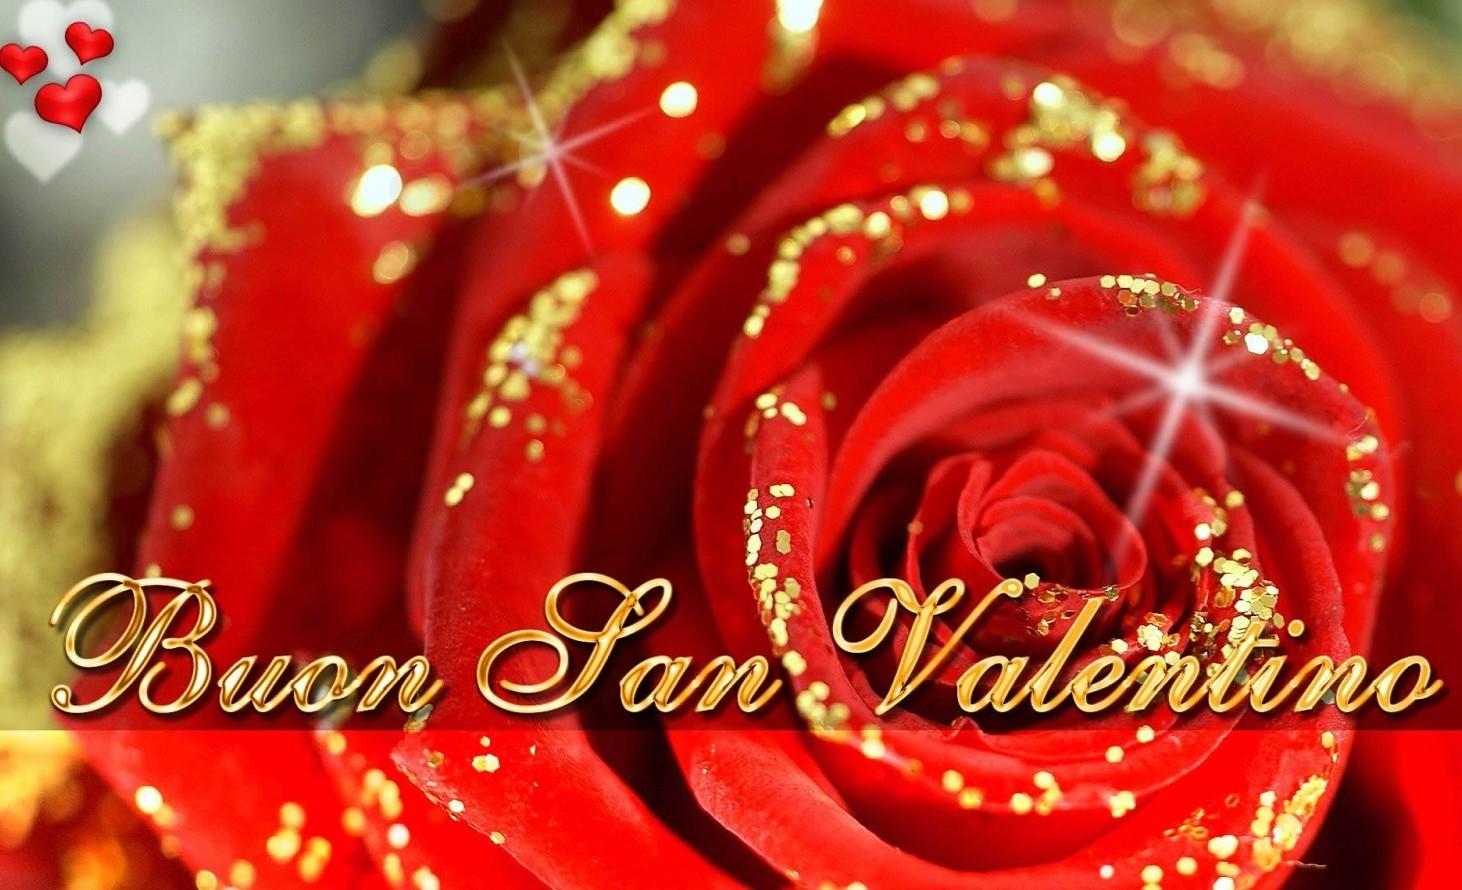 Auguri di San Valentino: frasi, video, i